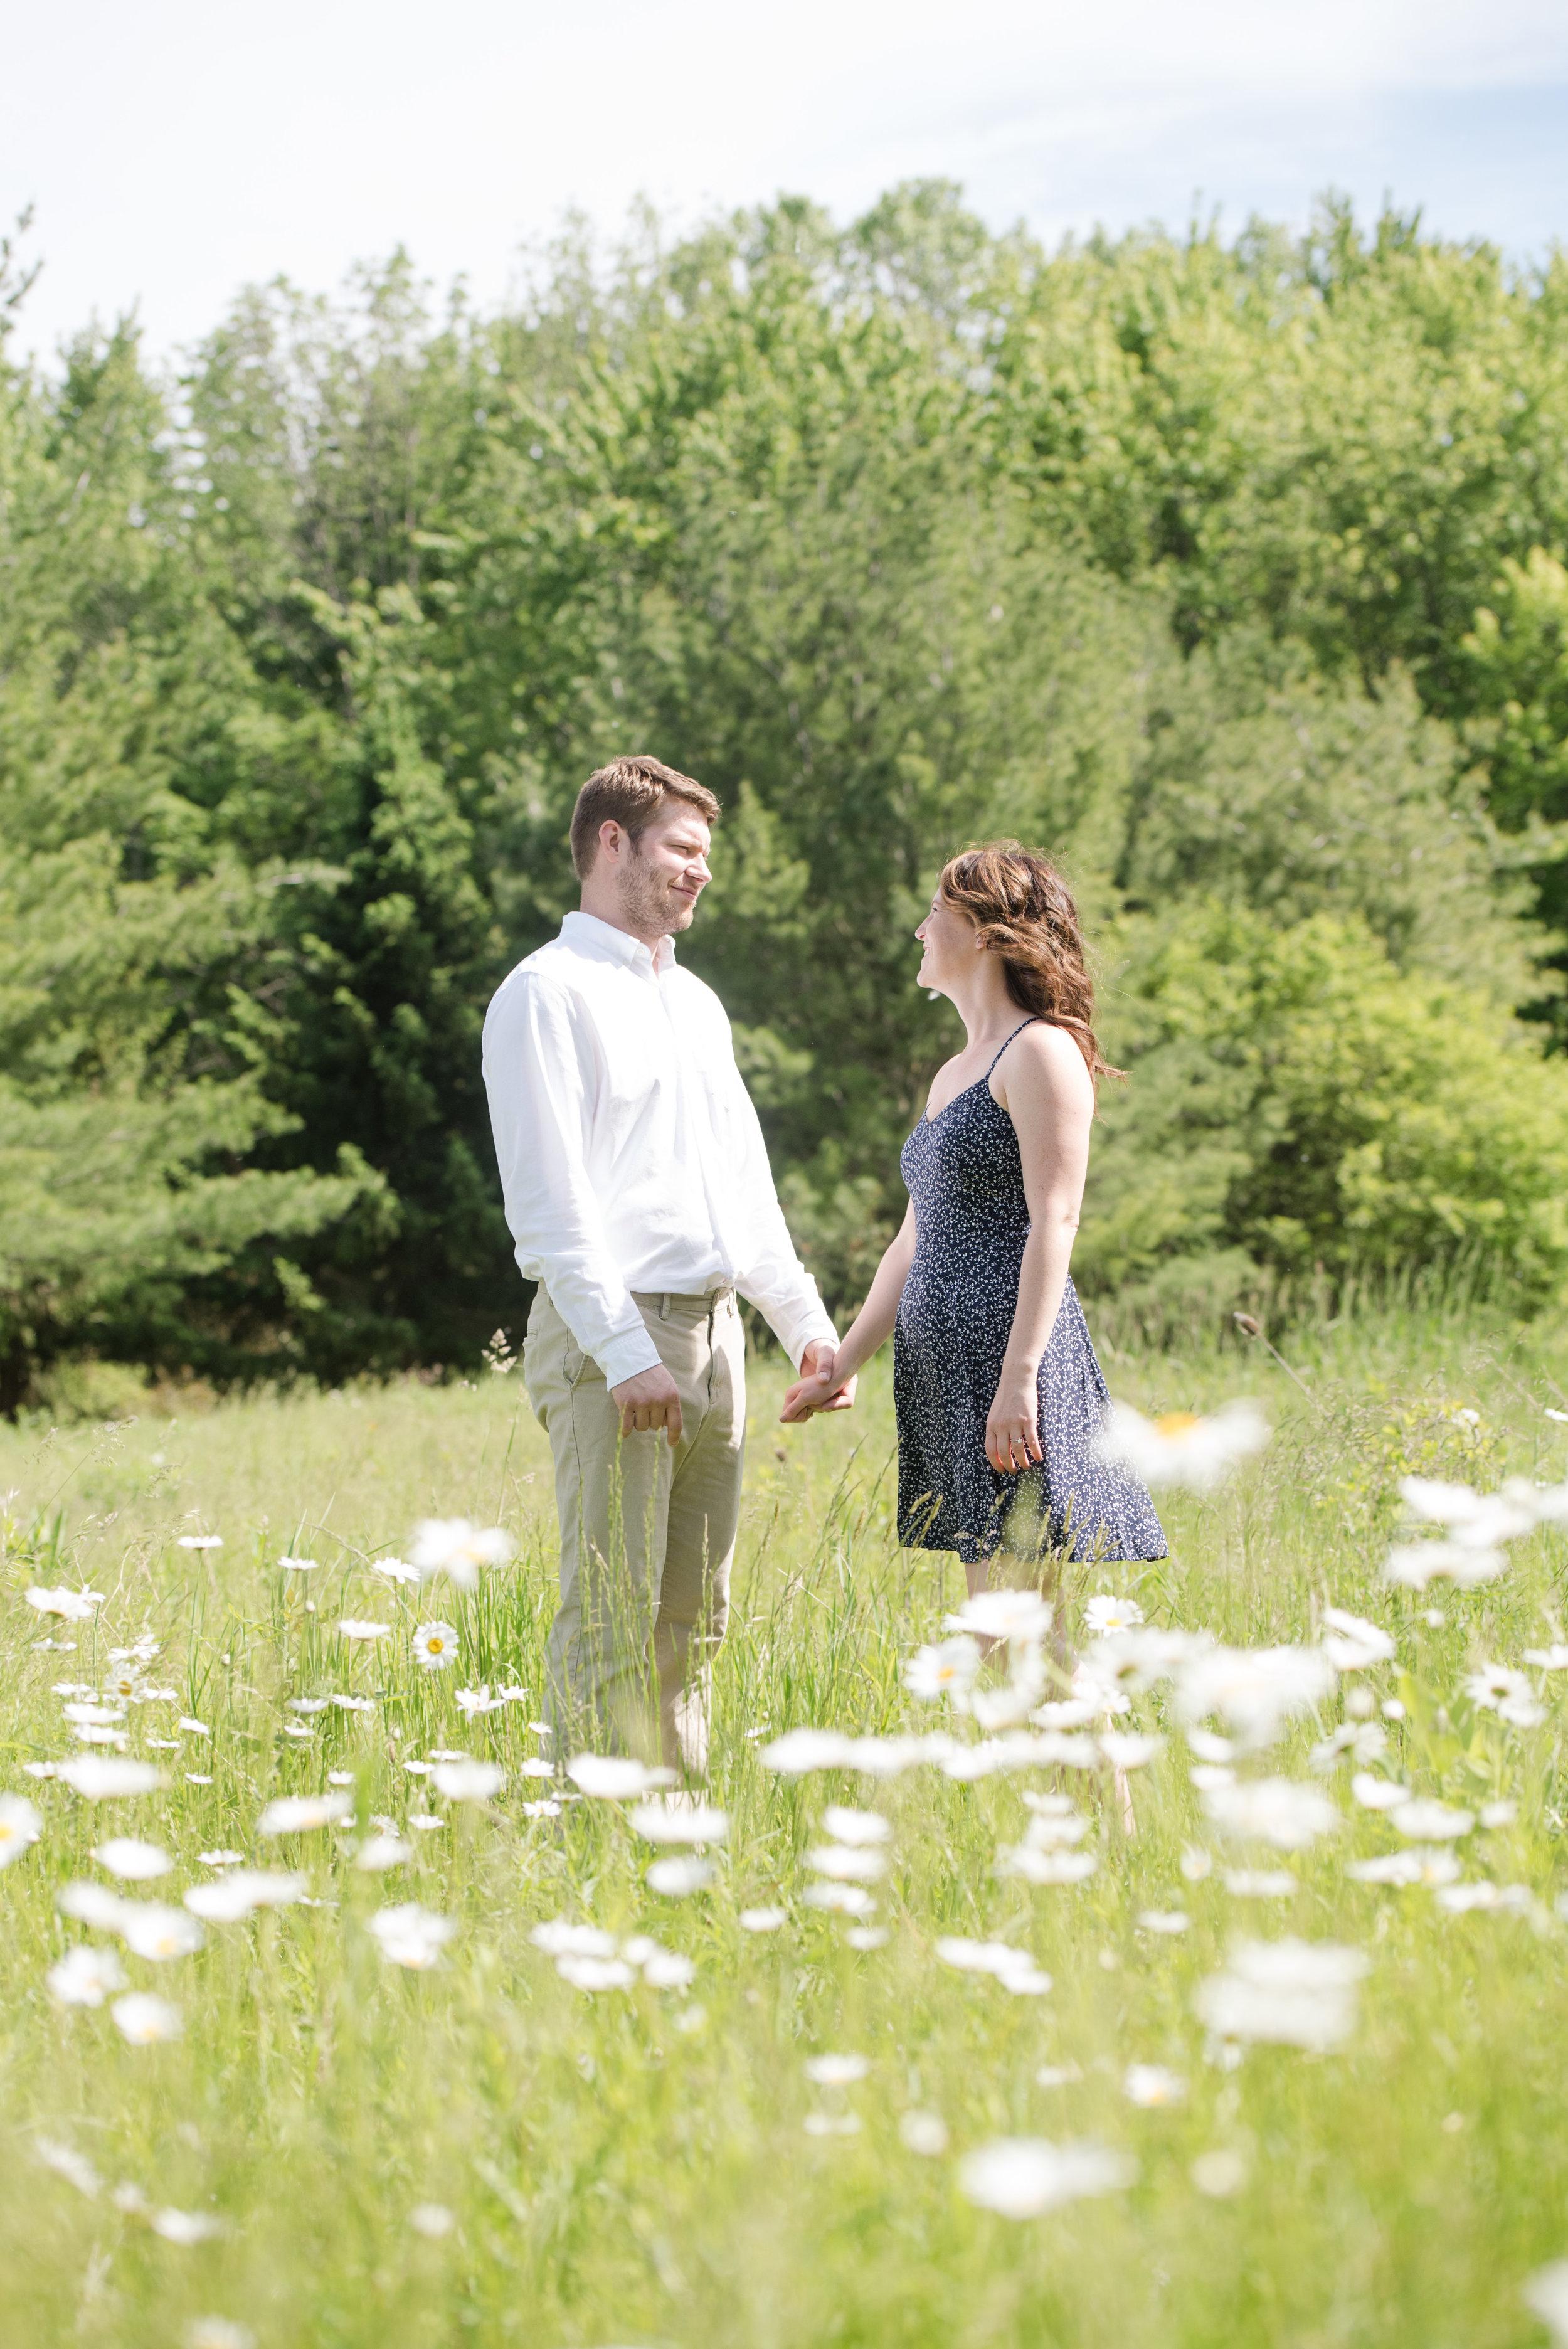 GALLERY-2019-6-9 Kaitlin, Justin & Liam Engagement 0557 70.jpg